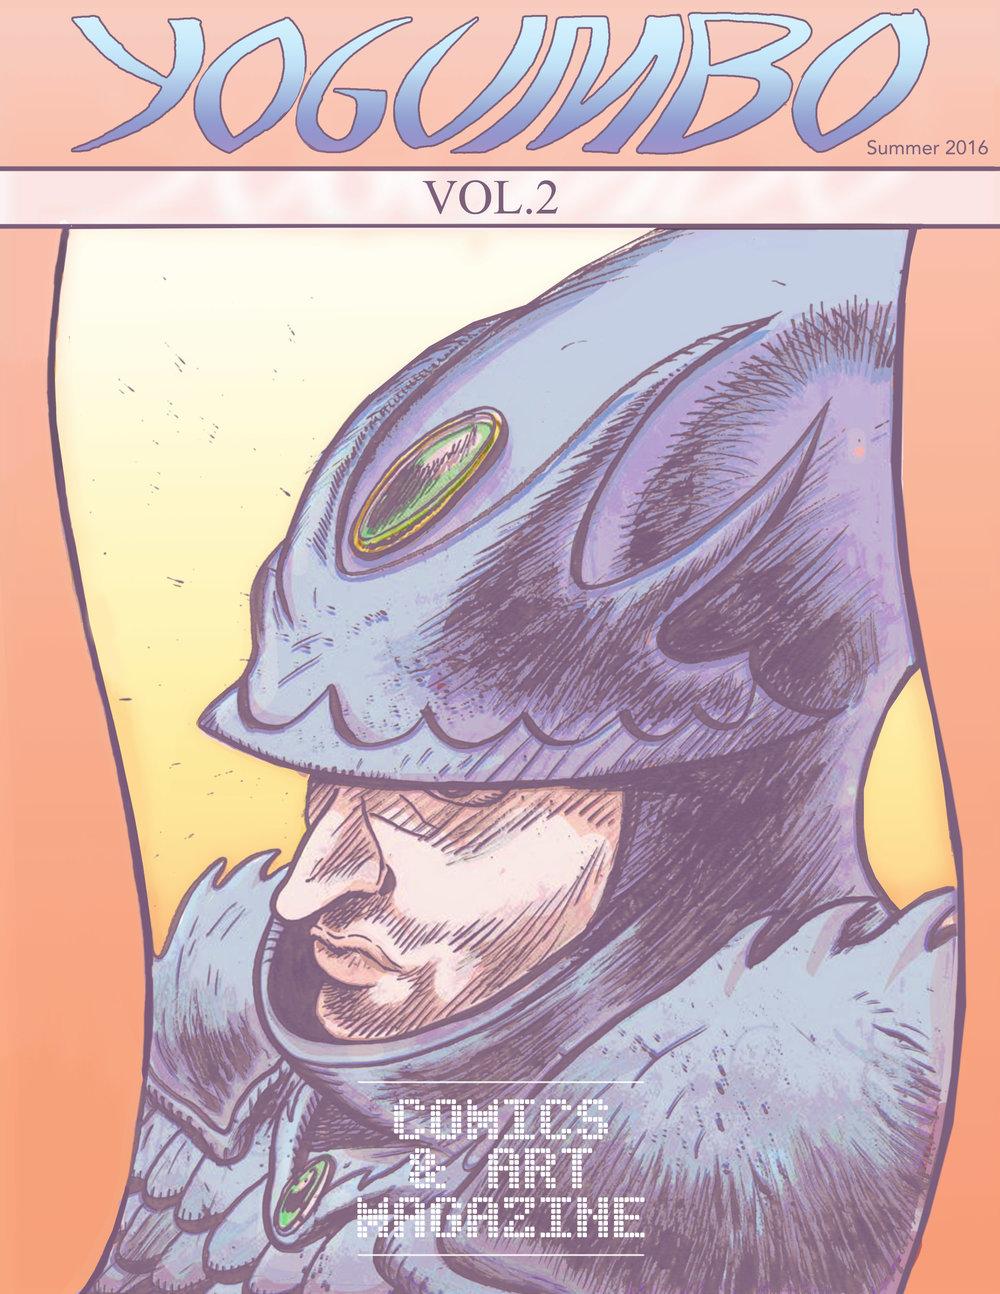 Vol. 2 Cover, 2016